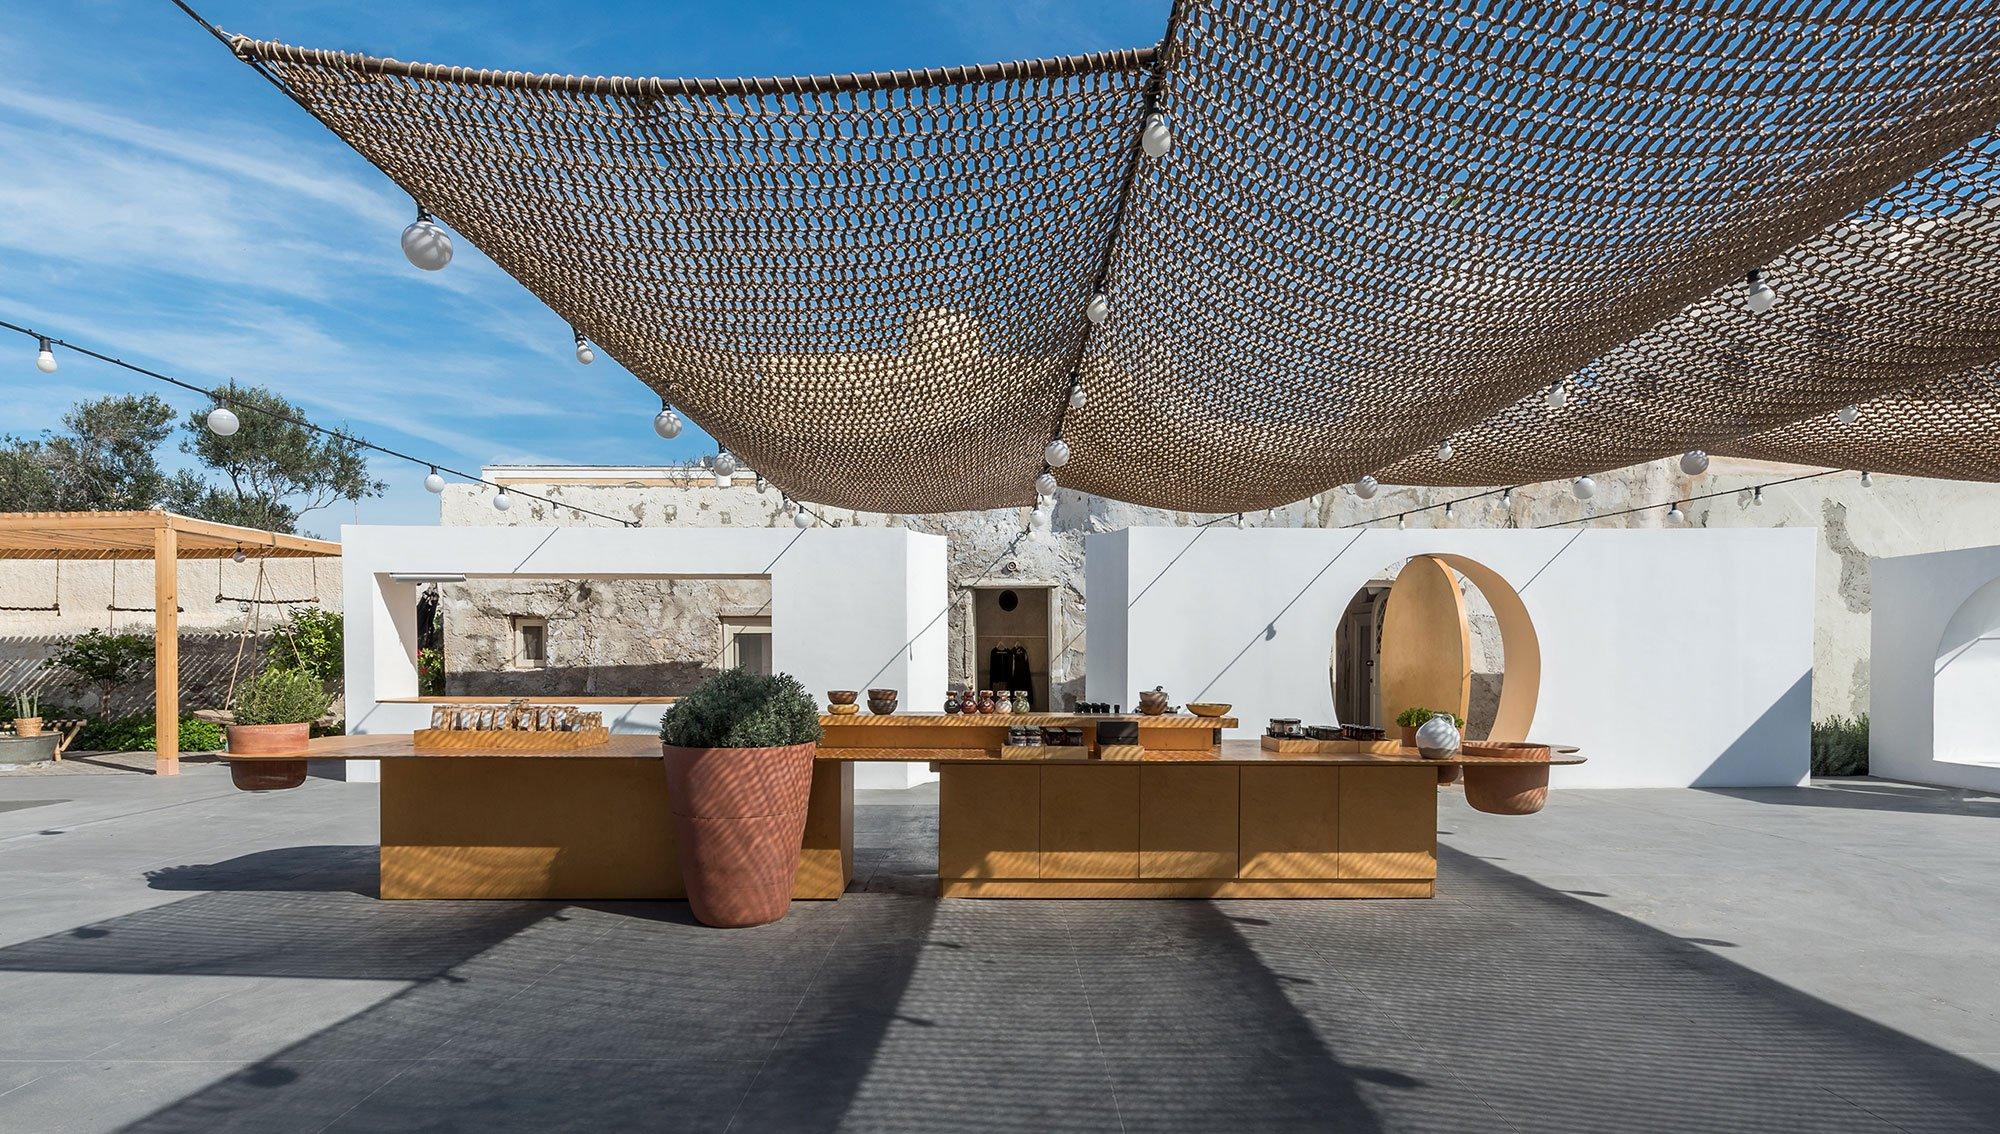 p1_open_market_in_santorini_greece_by_kapsimalis_architects_yatzer